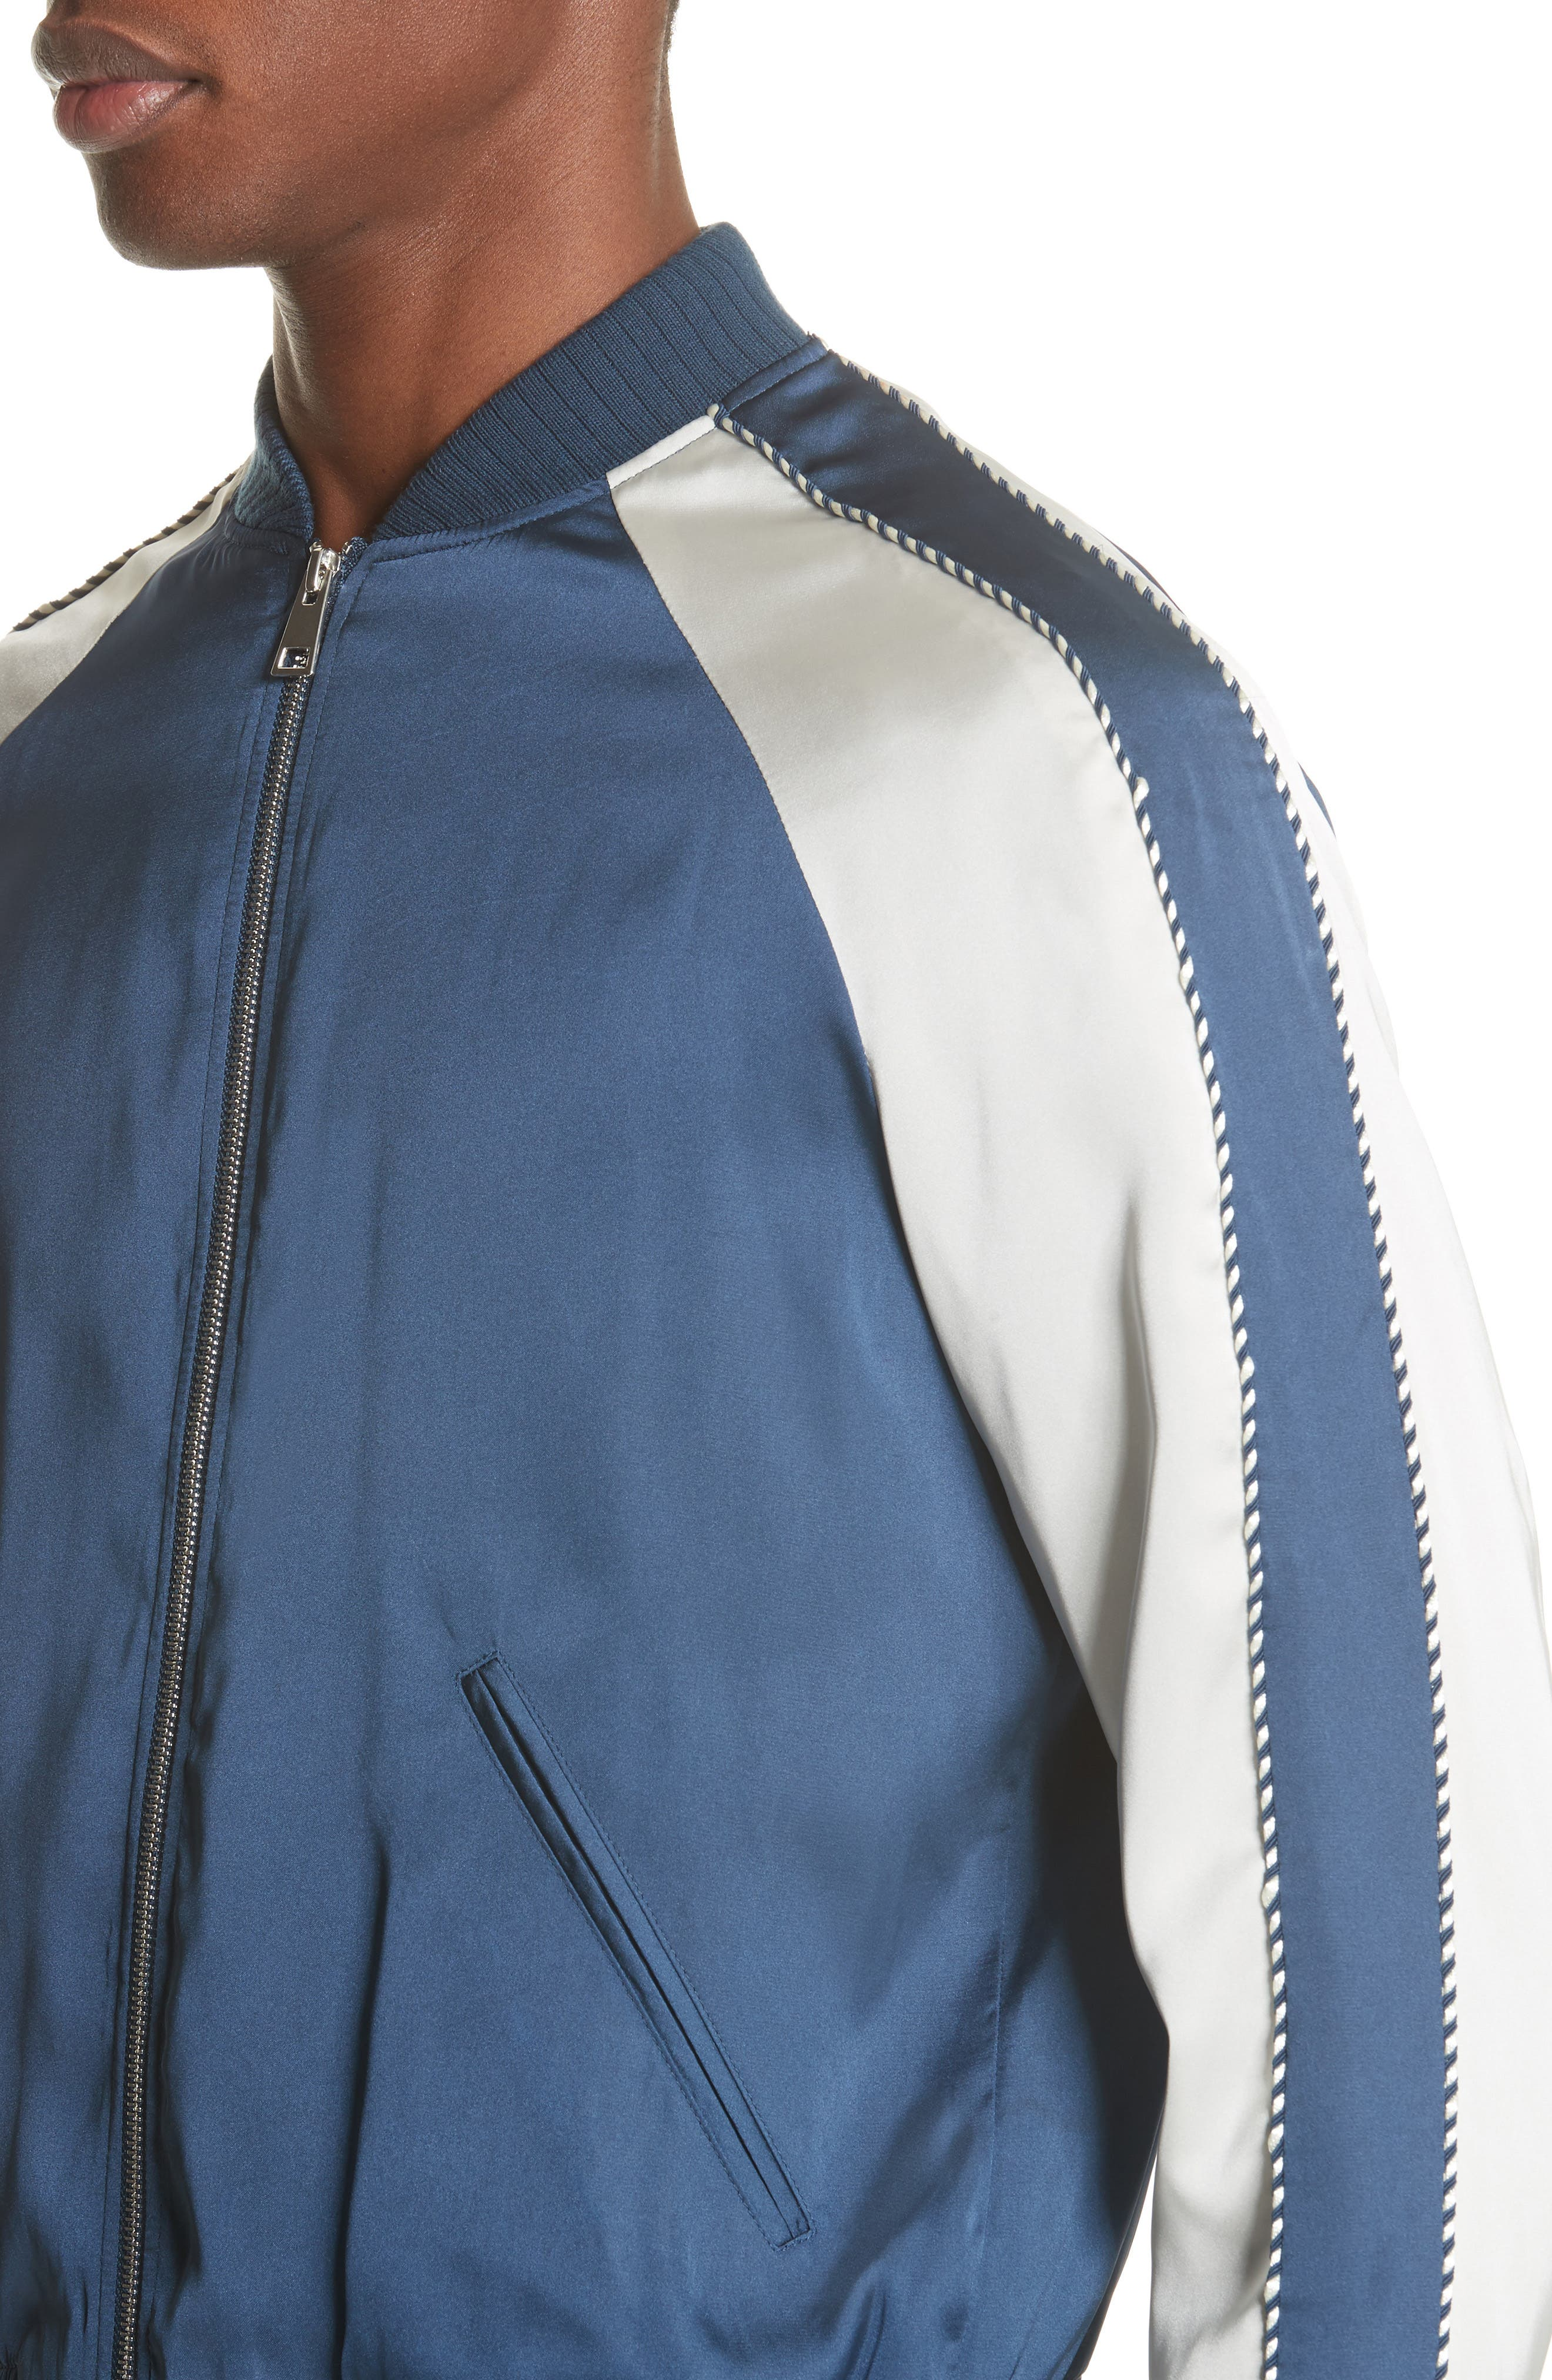 Satin Souvenir Bomber Jacket,                             Alternate thumbnail 4, color,                             Blue